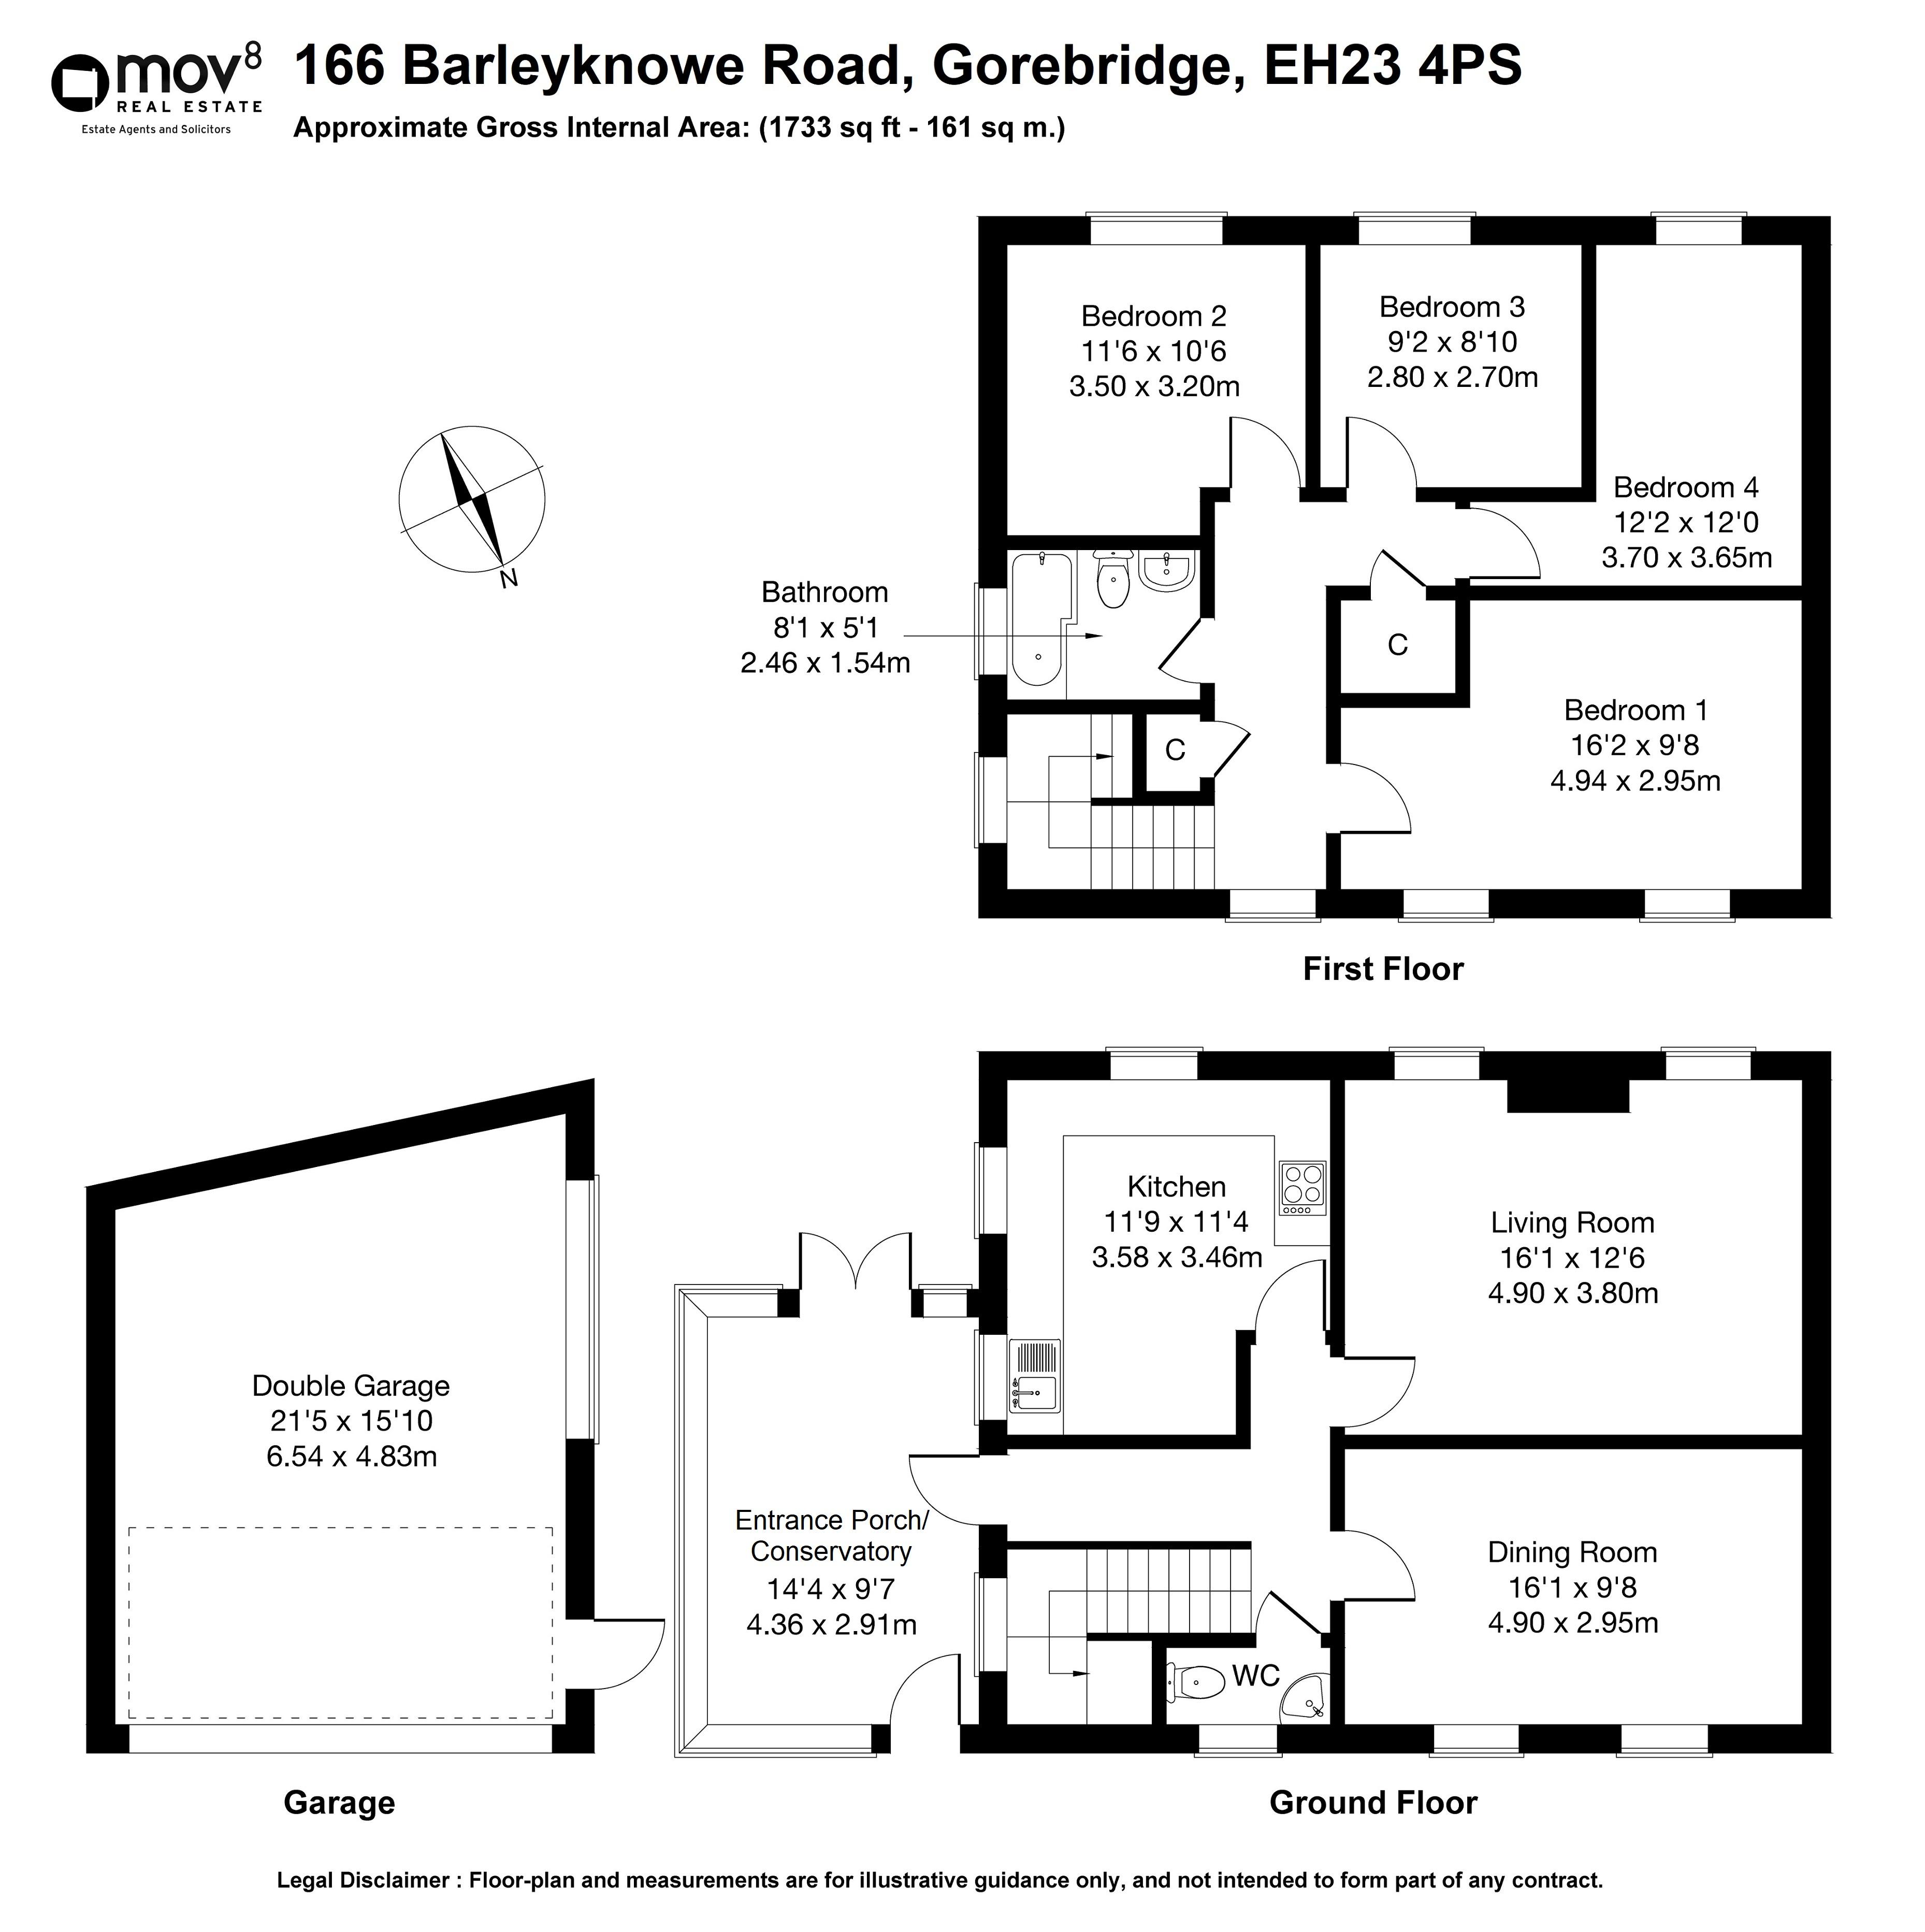 Floorplan 1 of 166 Barleyknowe Road, Gorebridge, Midlothian, EH23 4PS